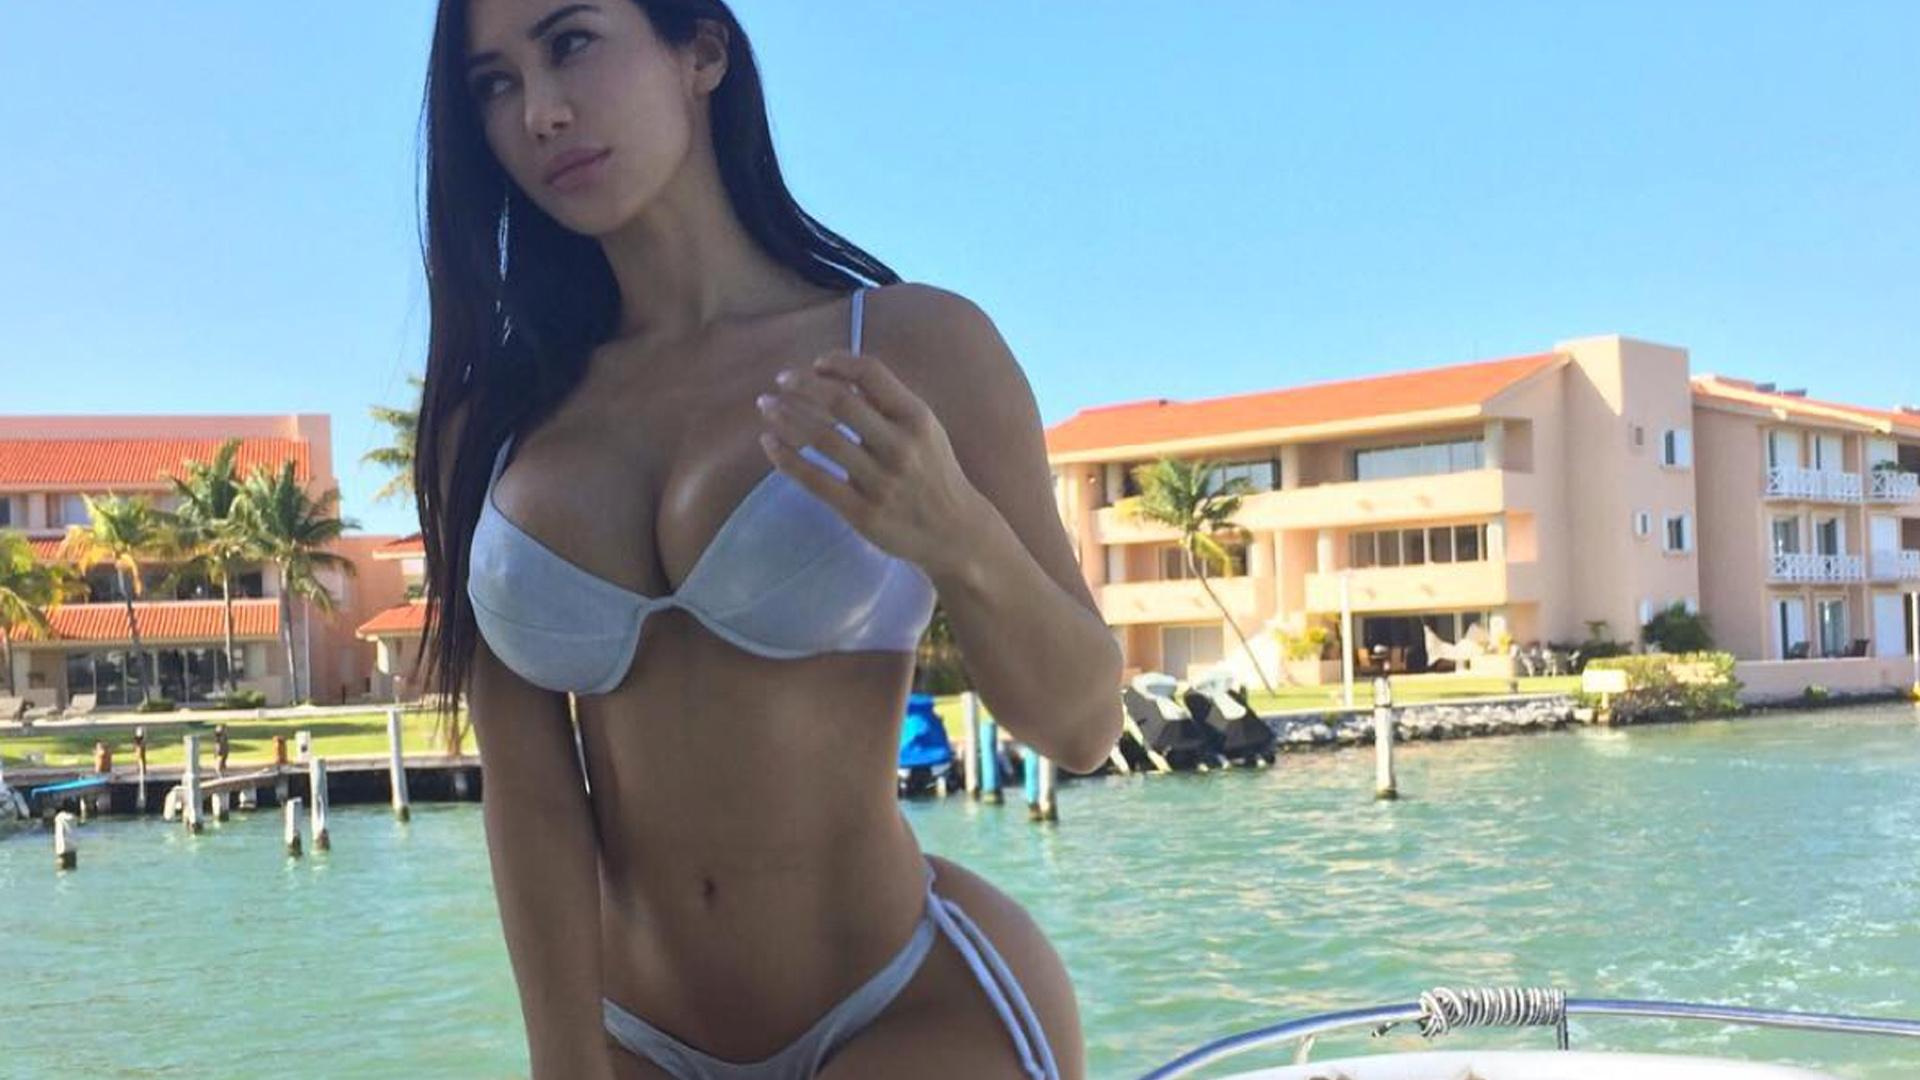 Lingerie Videos Instagram Models Video Vixens Hip Hop